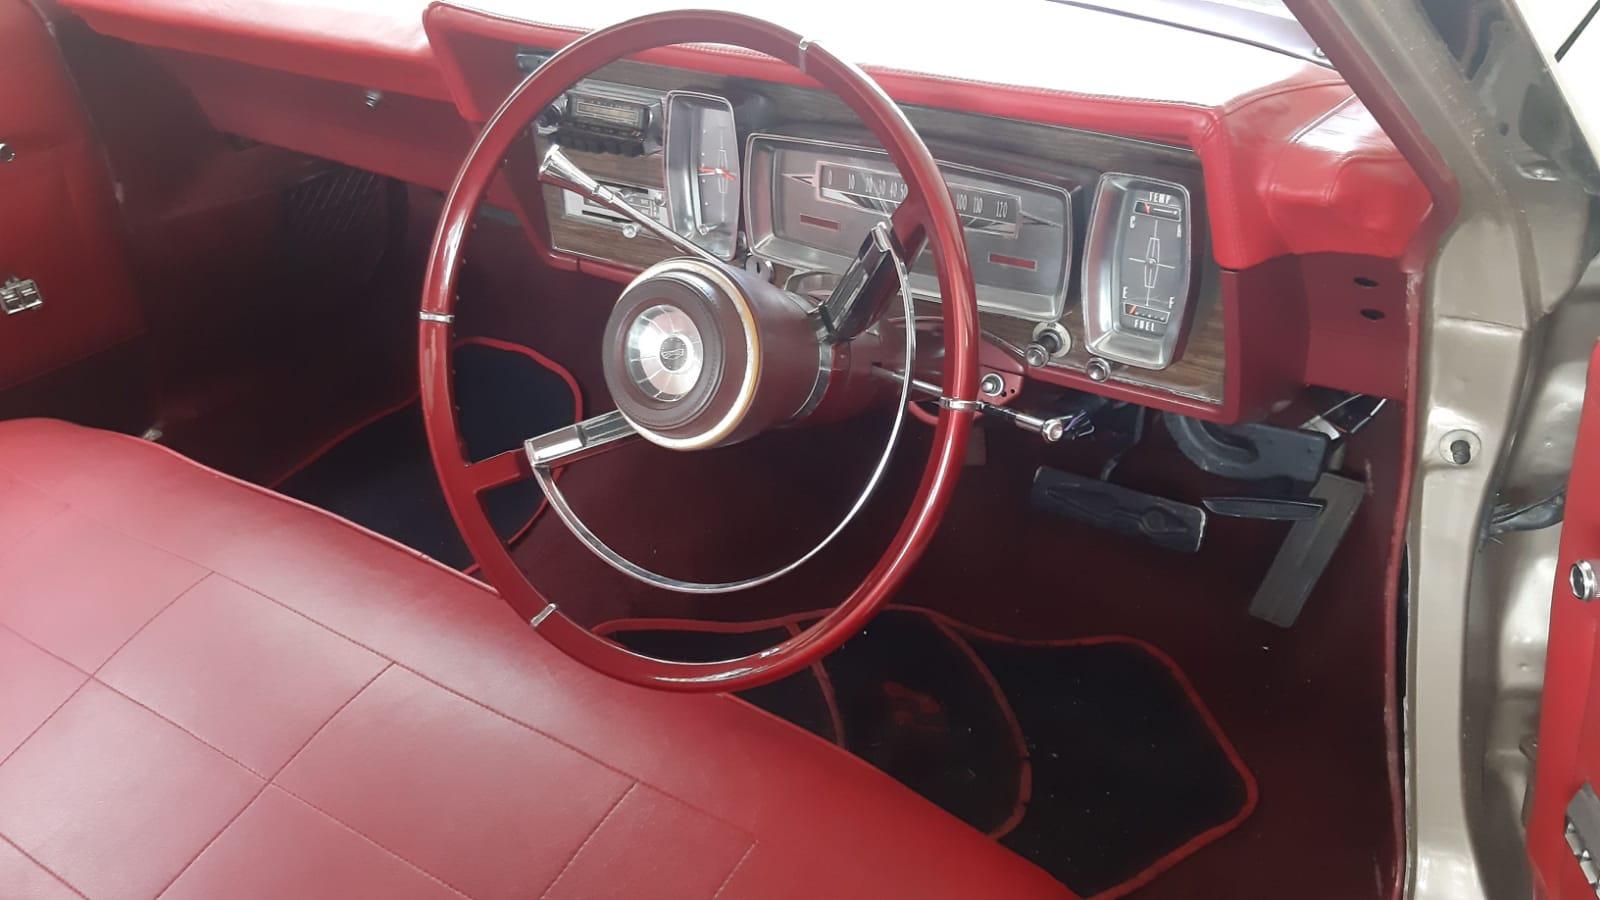 Ford Galaxie 500 (1967) - 6.4L V8 (390ci)